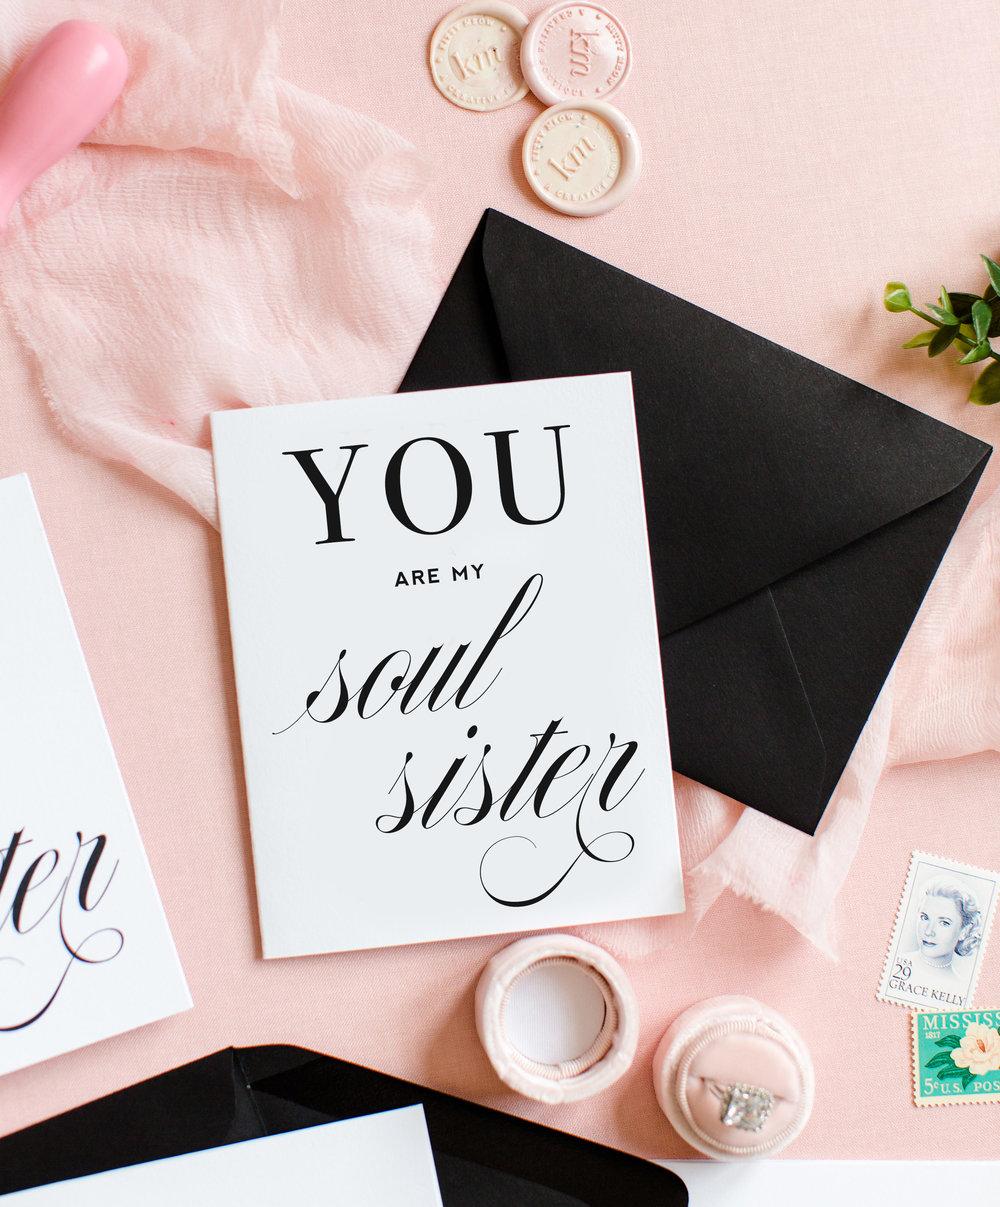 Kitty_Meow_Soul_Sister_Greeting_Card.jpg